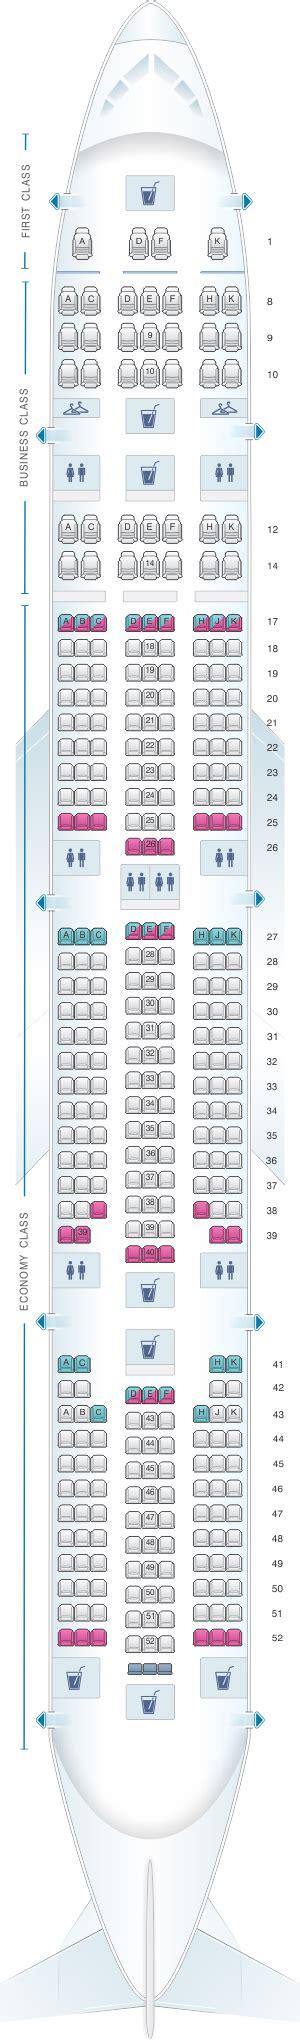 seating plan boeing 777 300er air india brokeasshome com